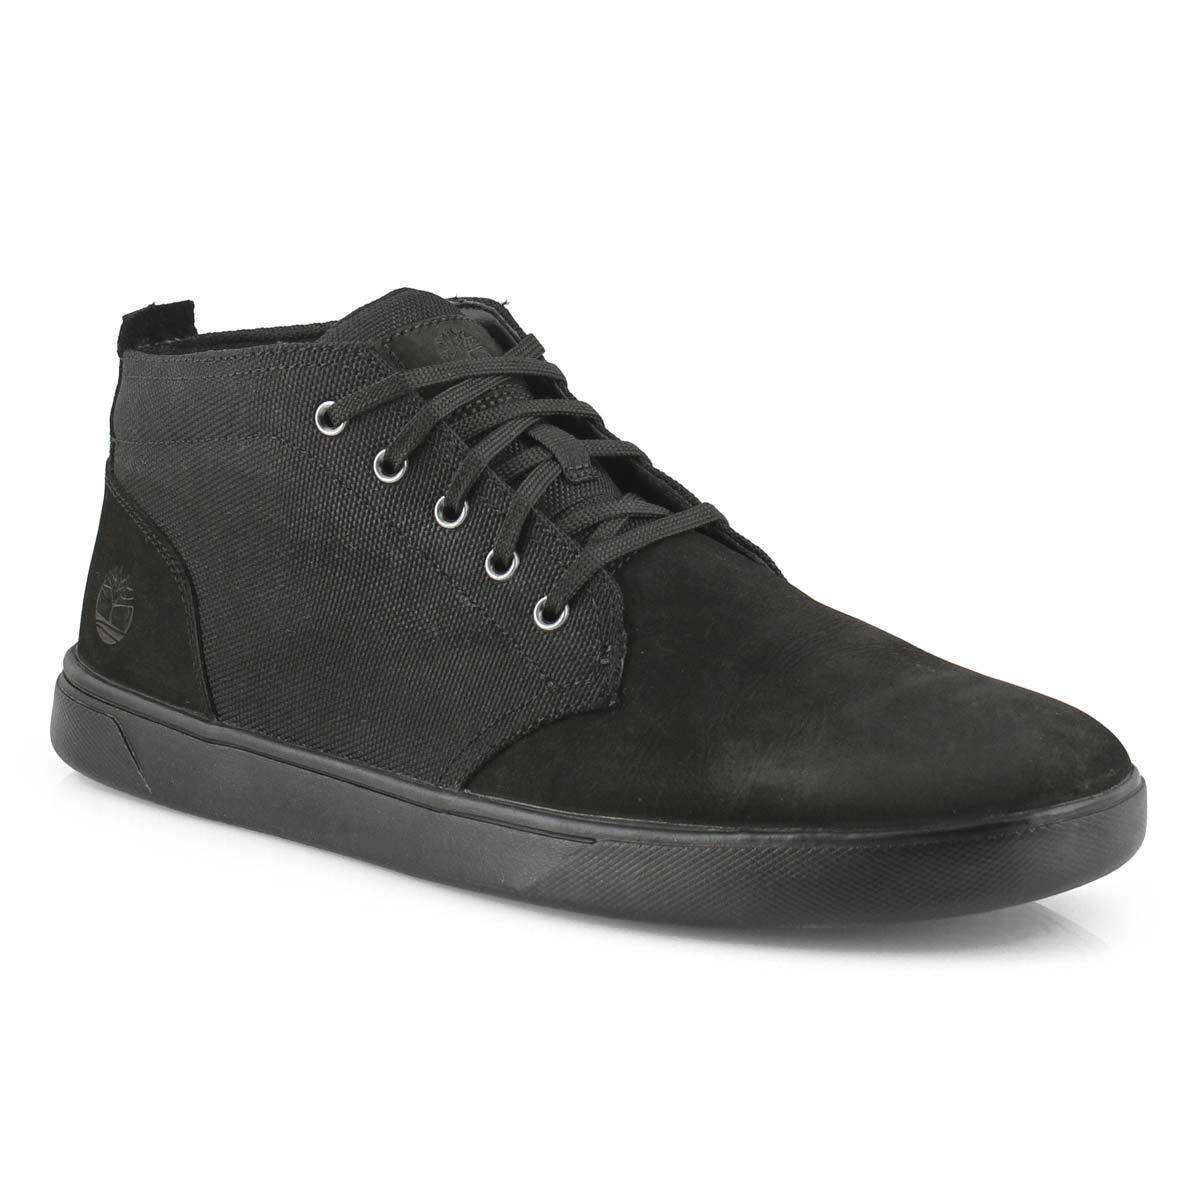 GROVETON black chukka boots